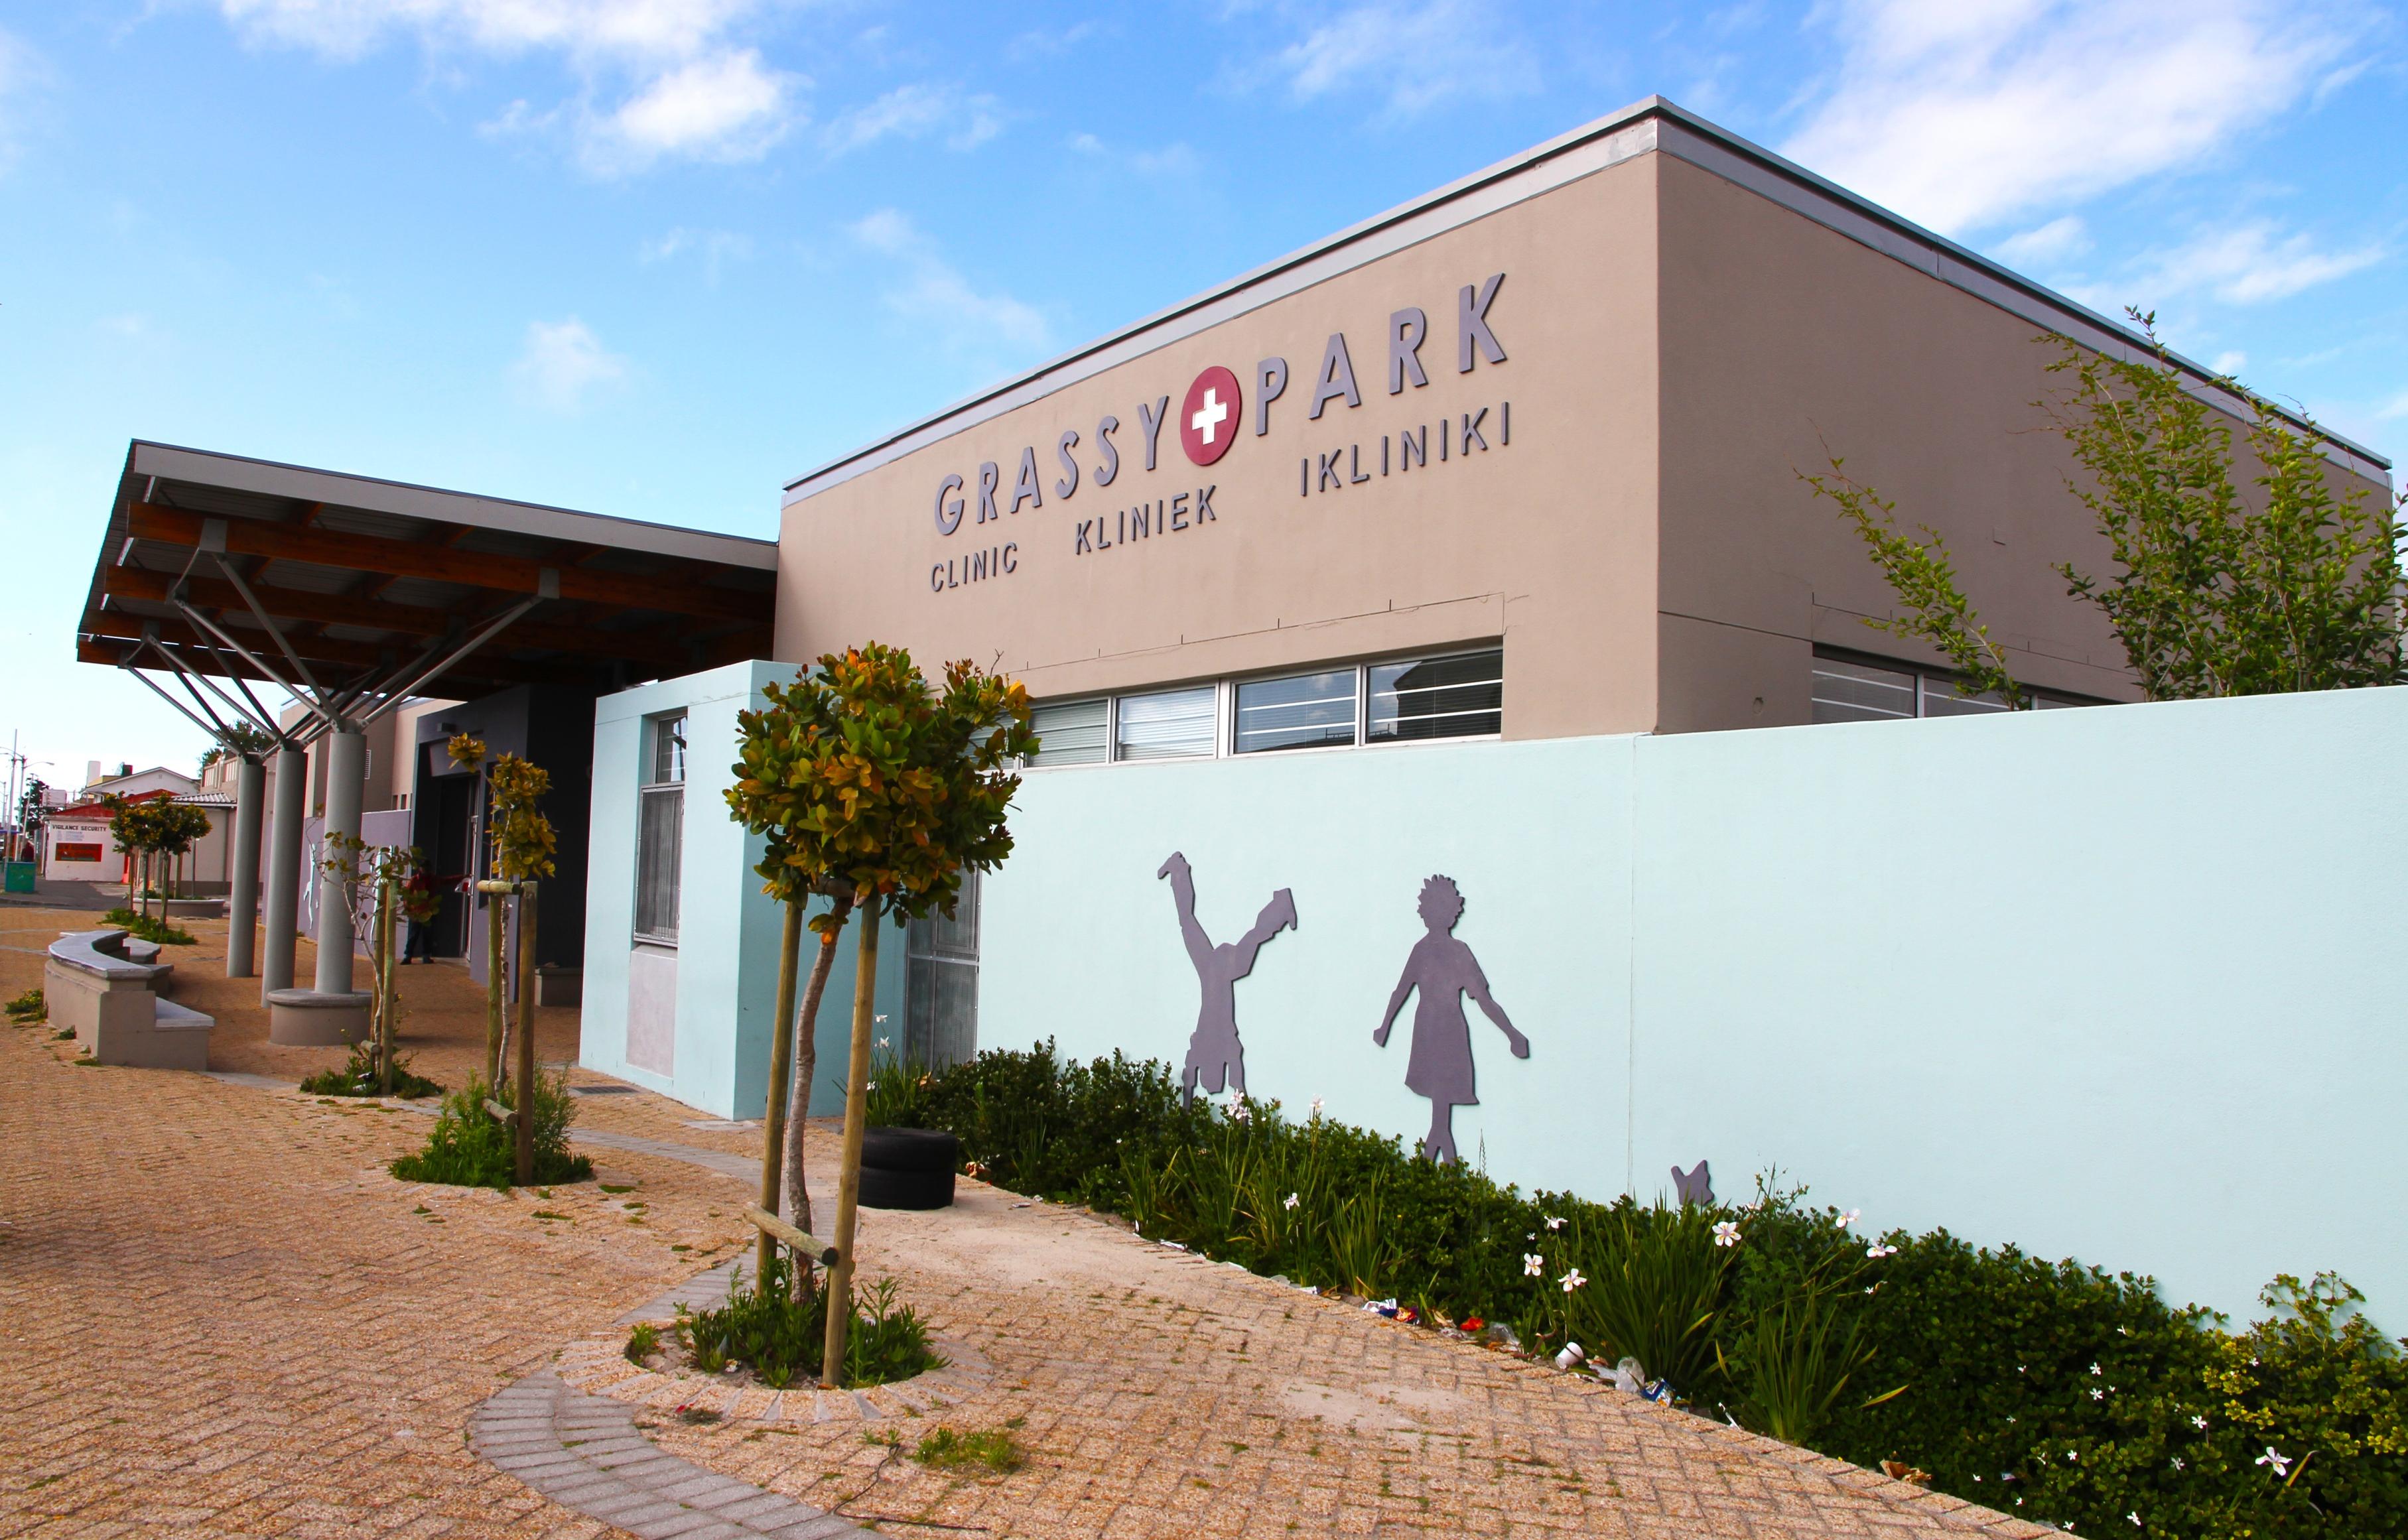 Grassy Park Clinic